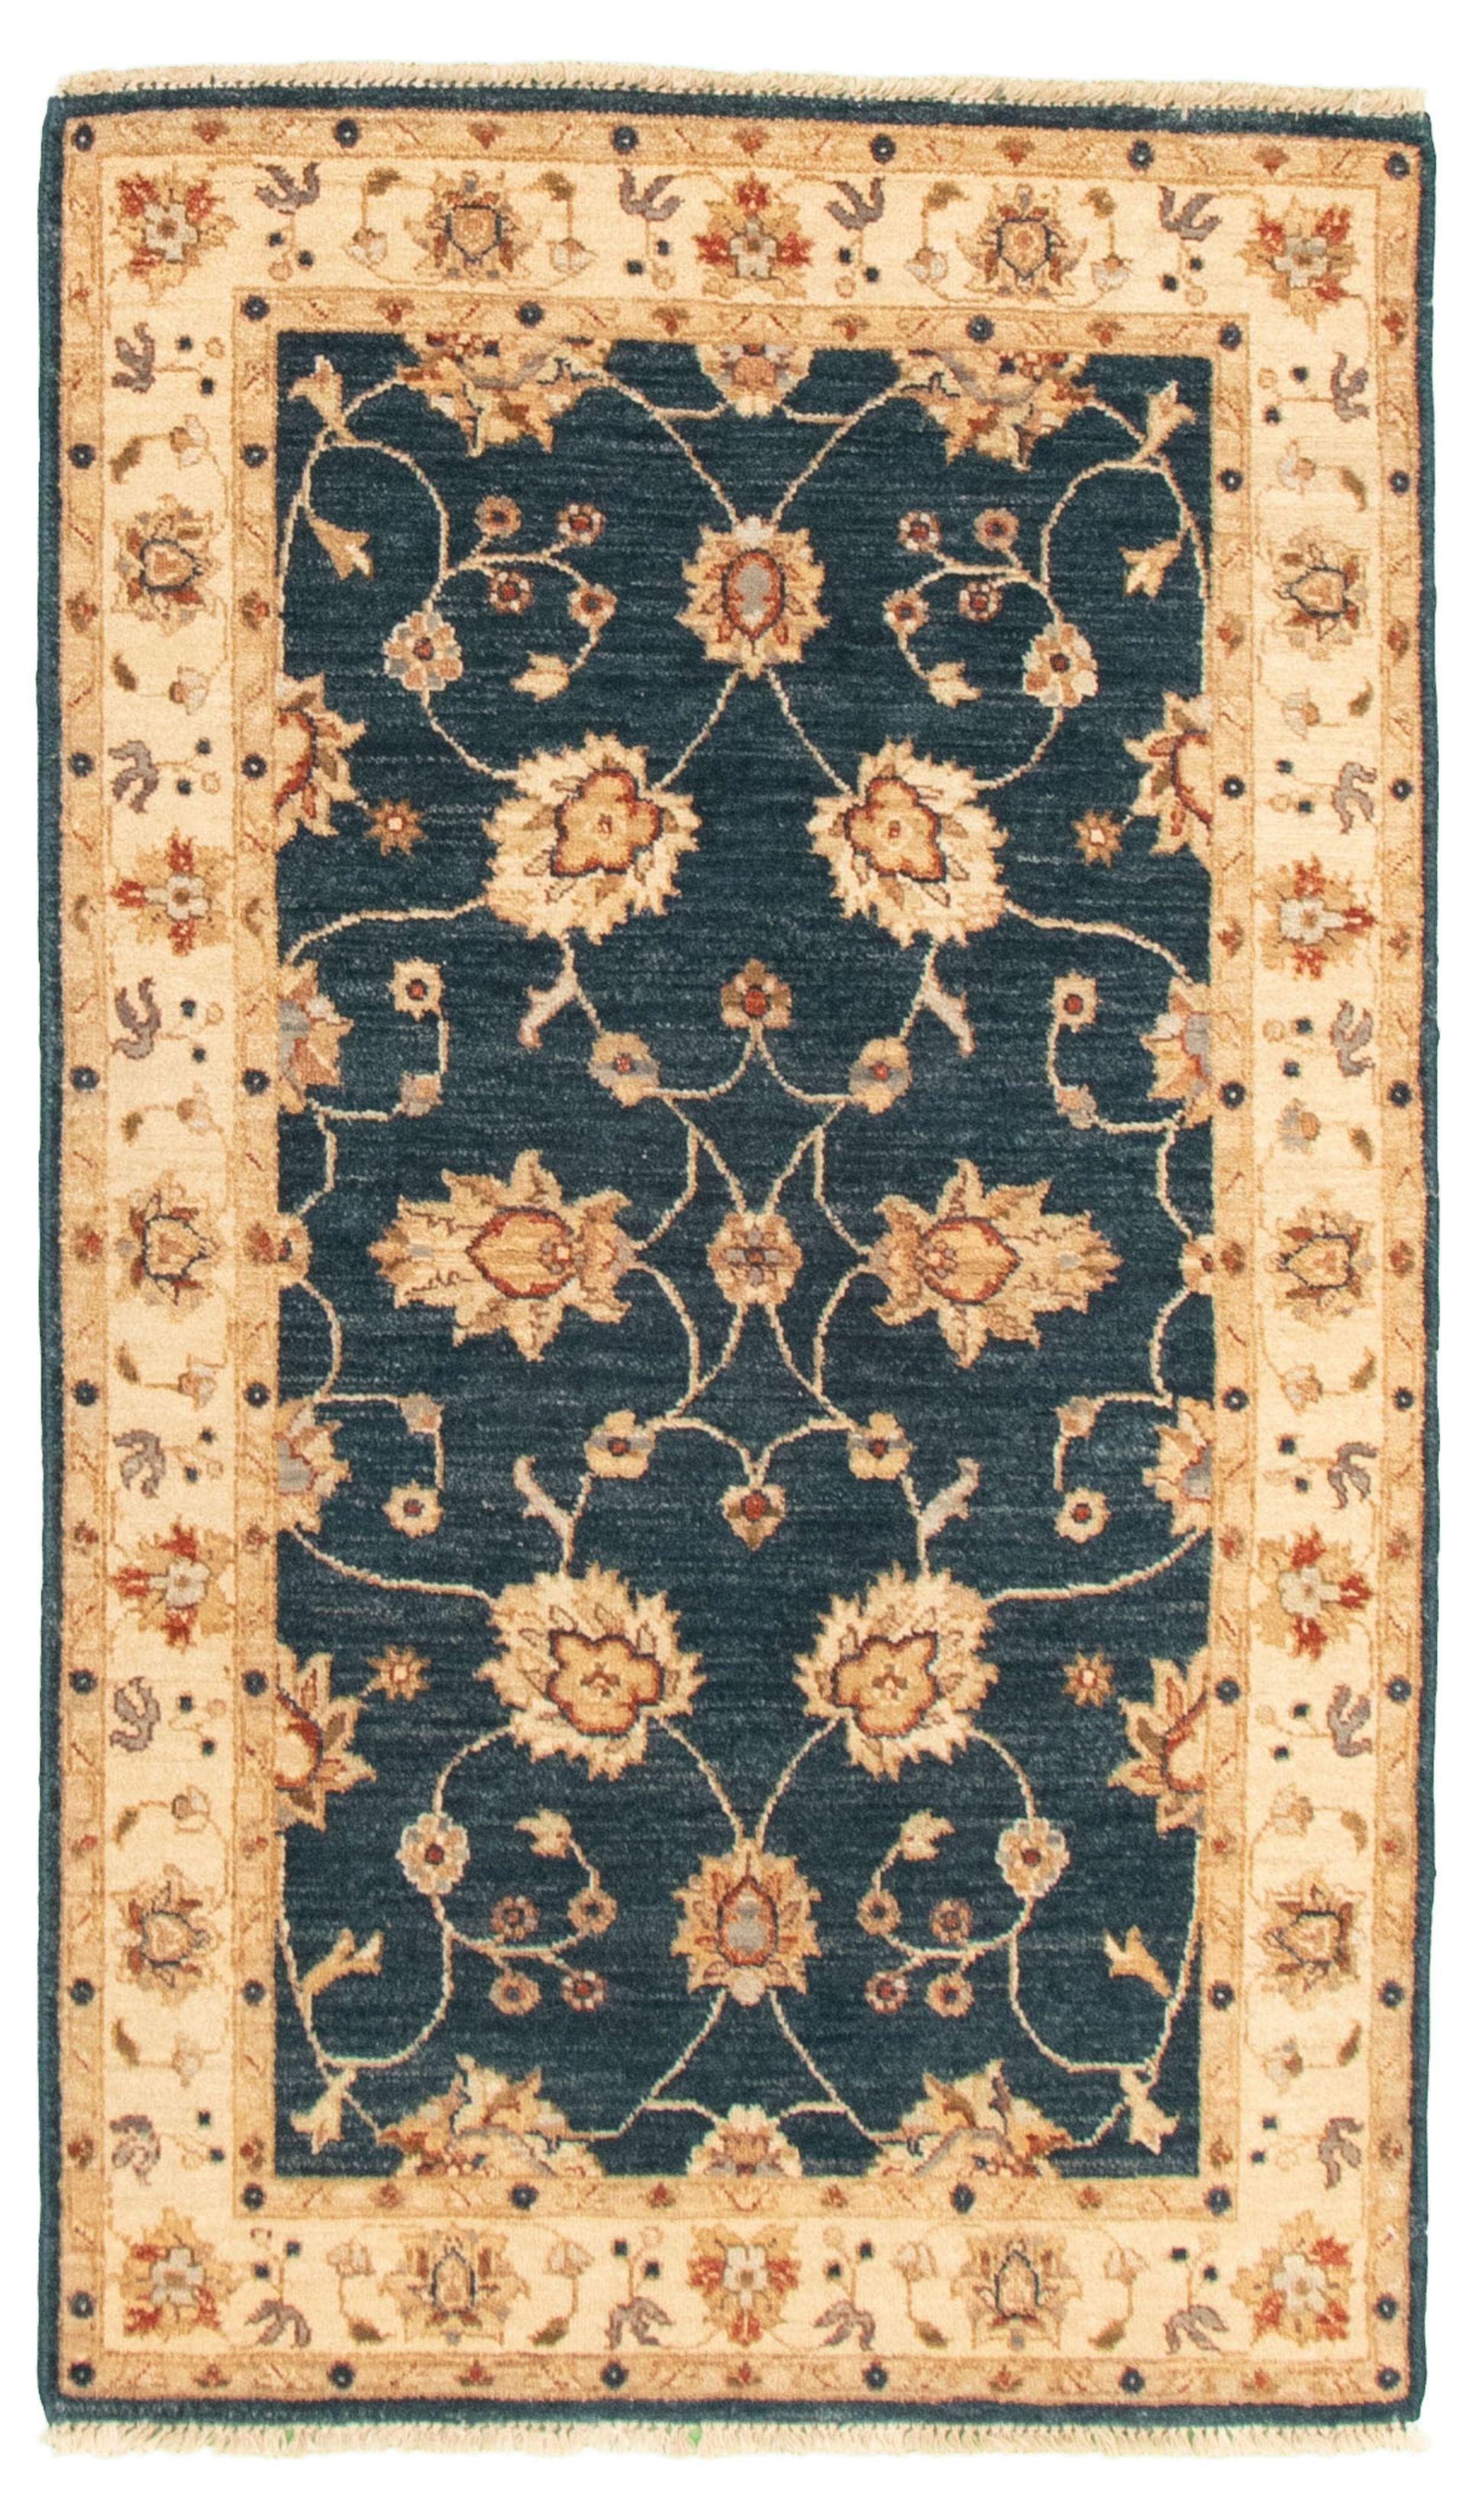 "Hand-knotted Chobi Finest Dark Blue Wool Rug 3'3"" x 5'4"" Size: 3'3"" x 5'4"""